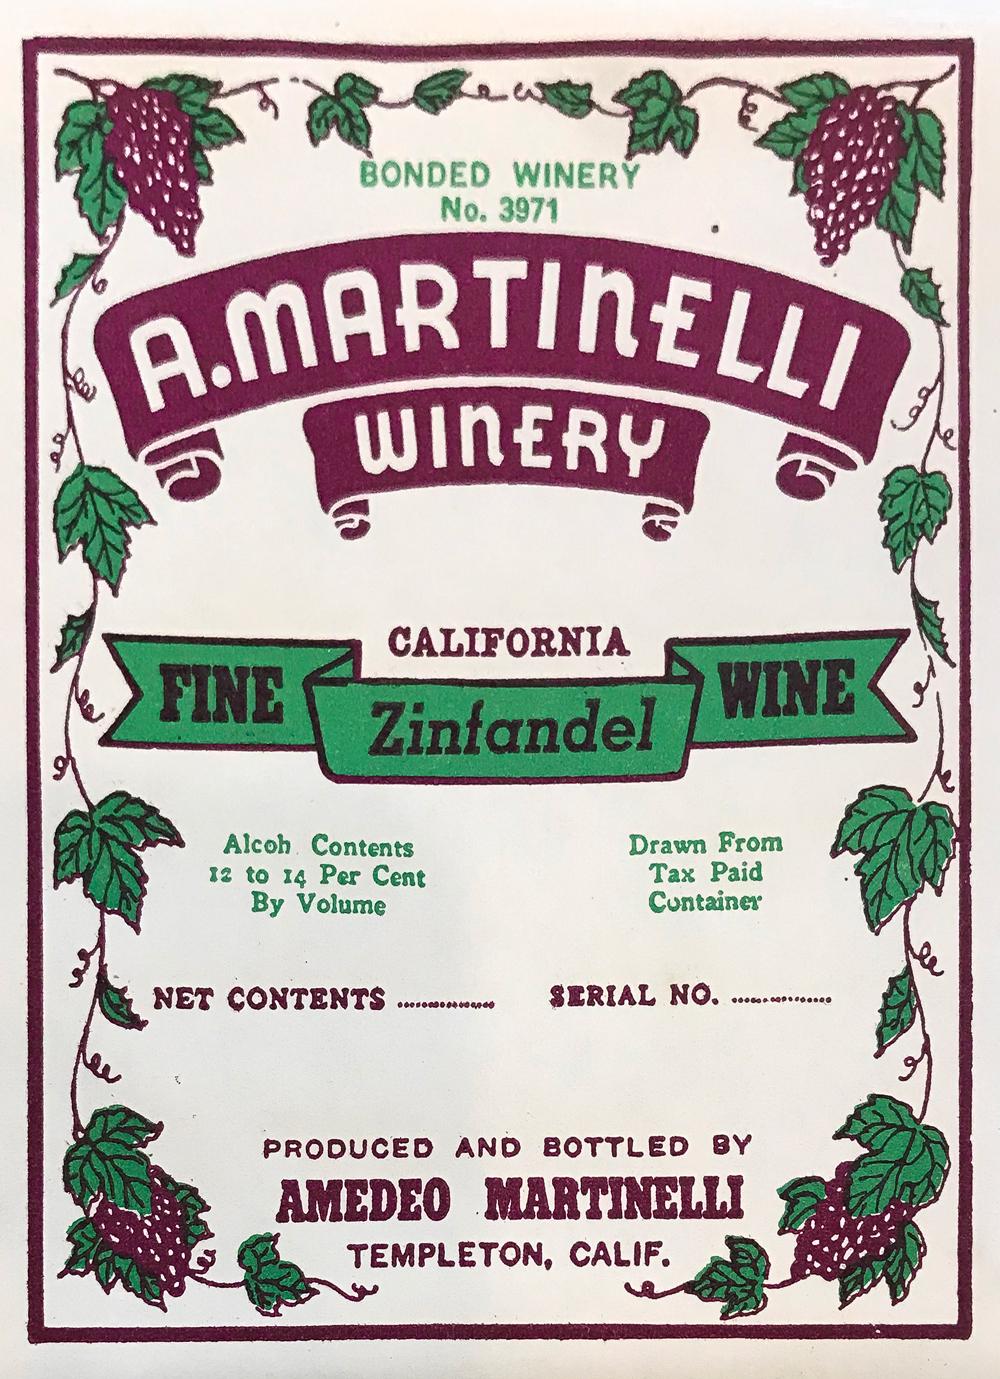 A. Martinelli Winery label: Fine Zinfandel Wine